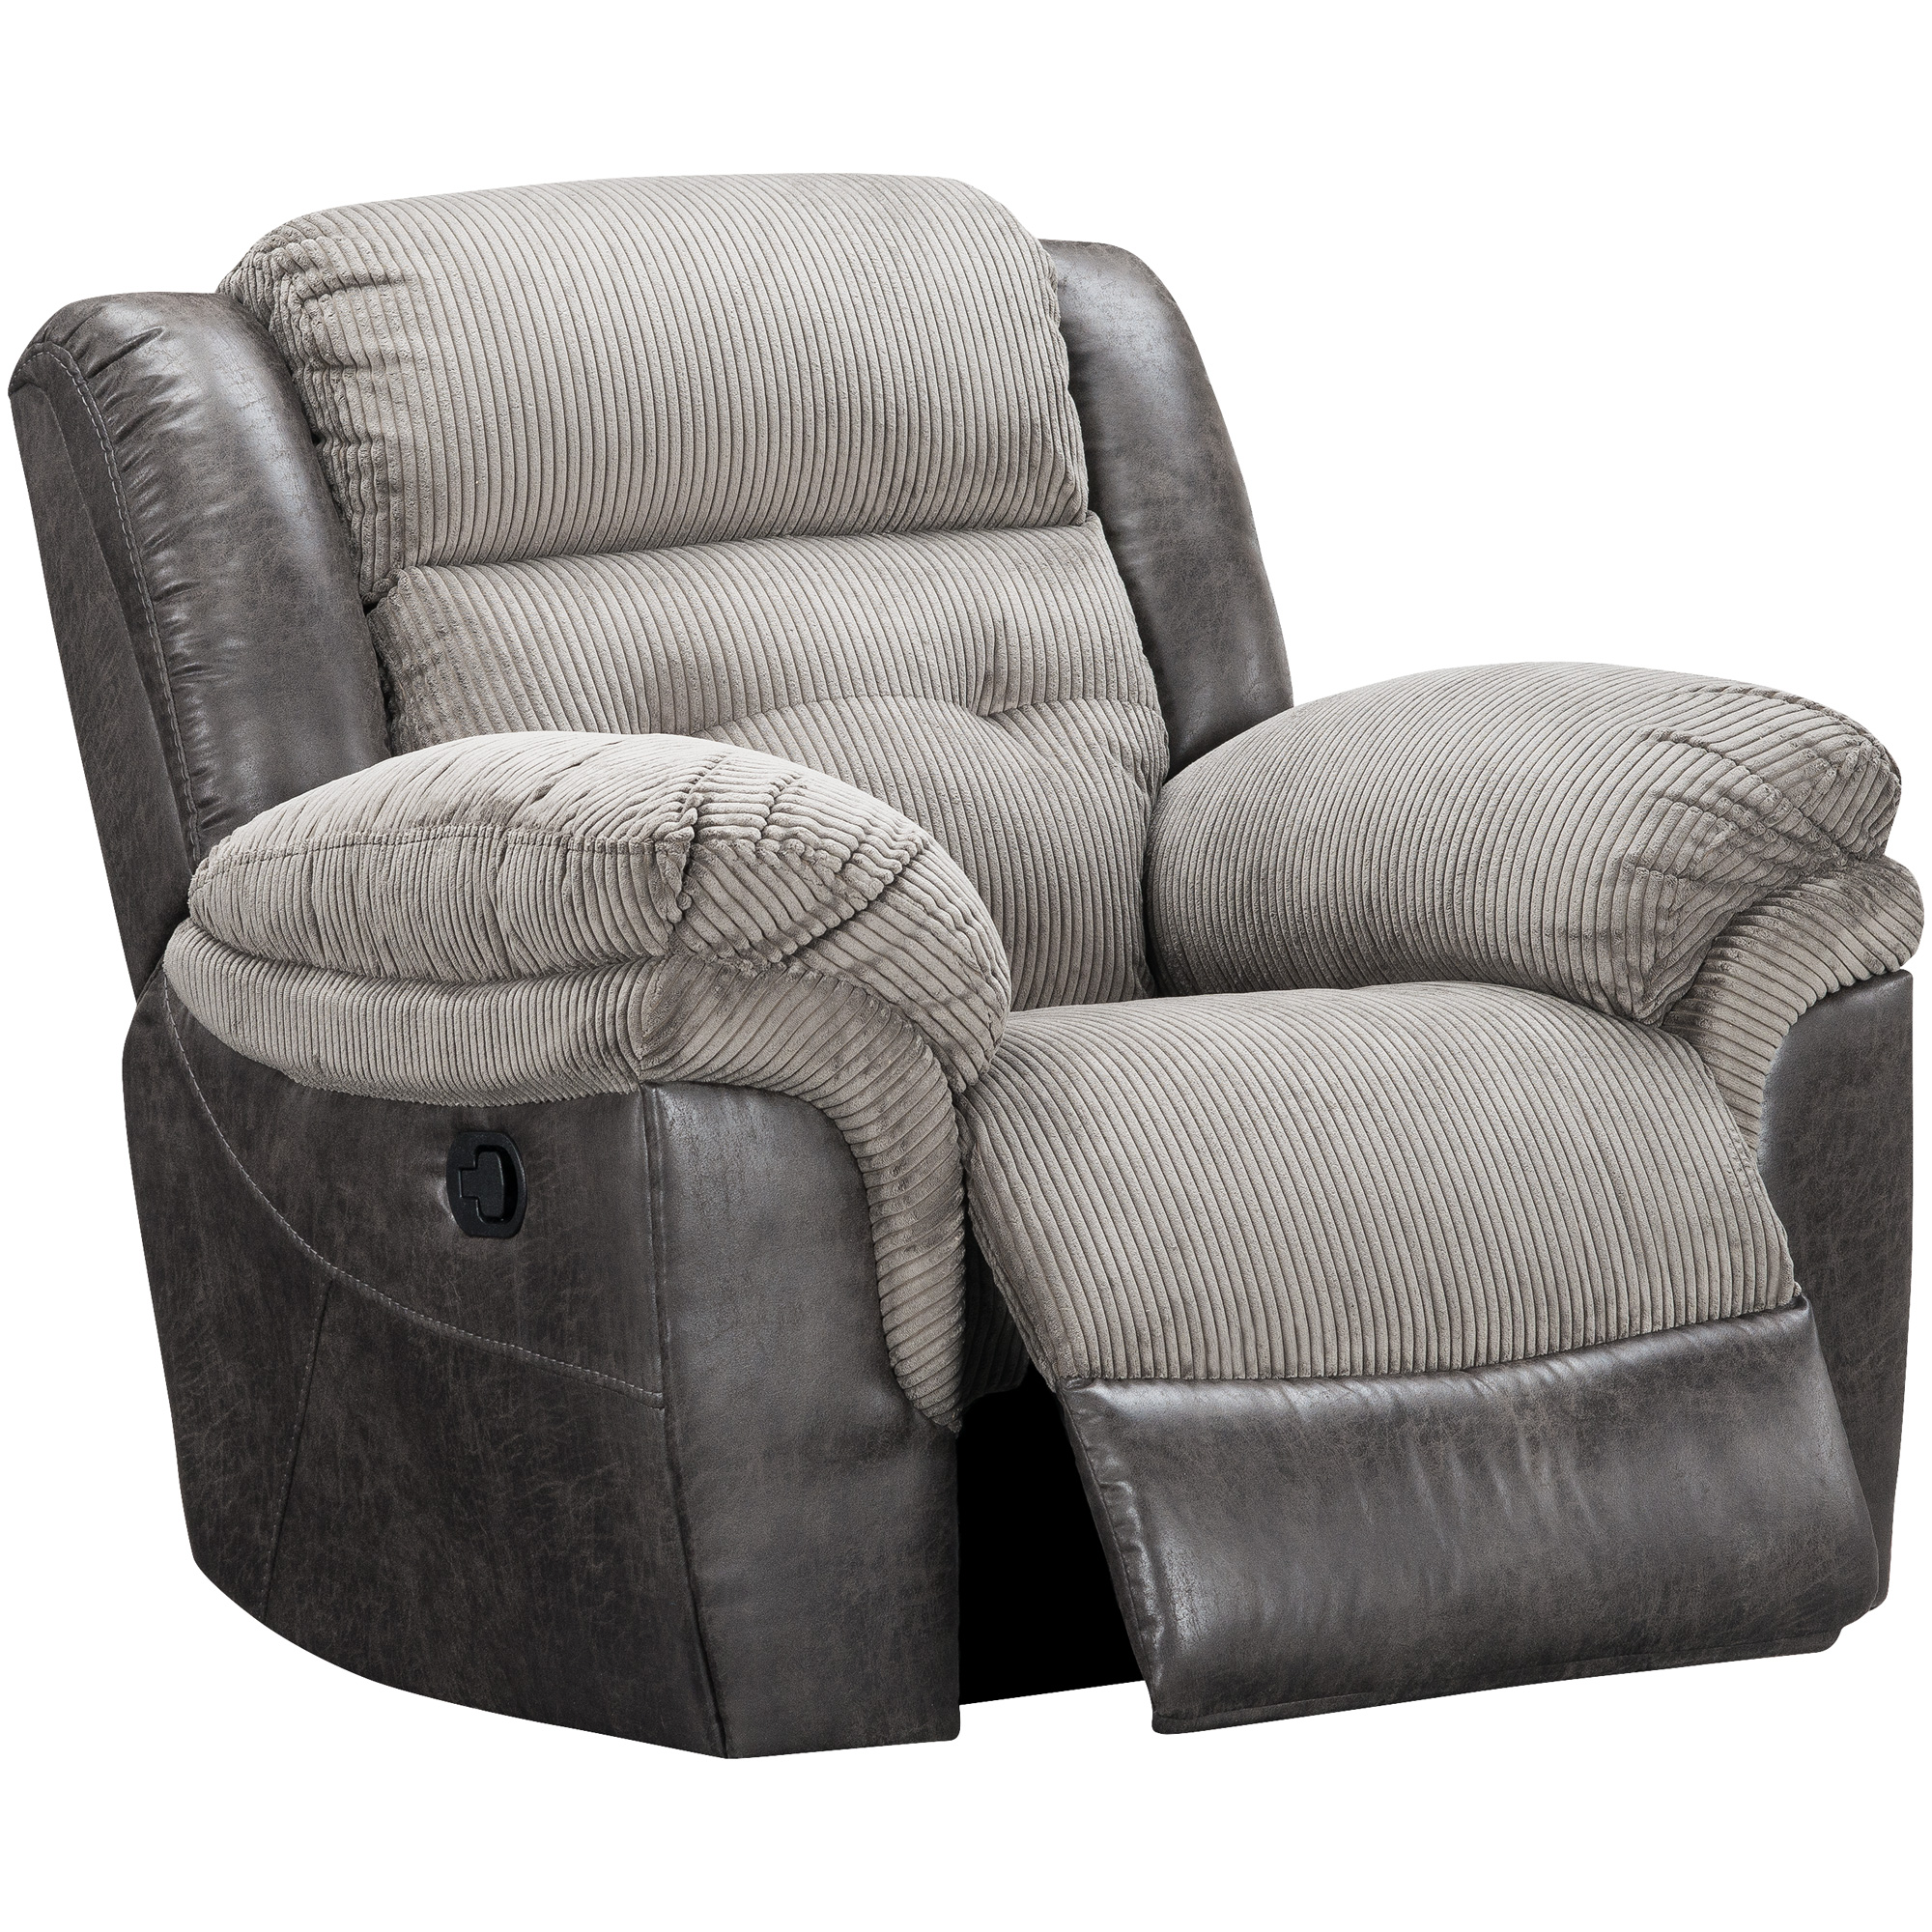 Wah Cheers | Dunkirk Steel Glider Chair Recliner